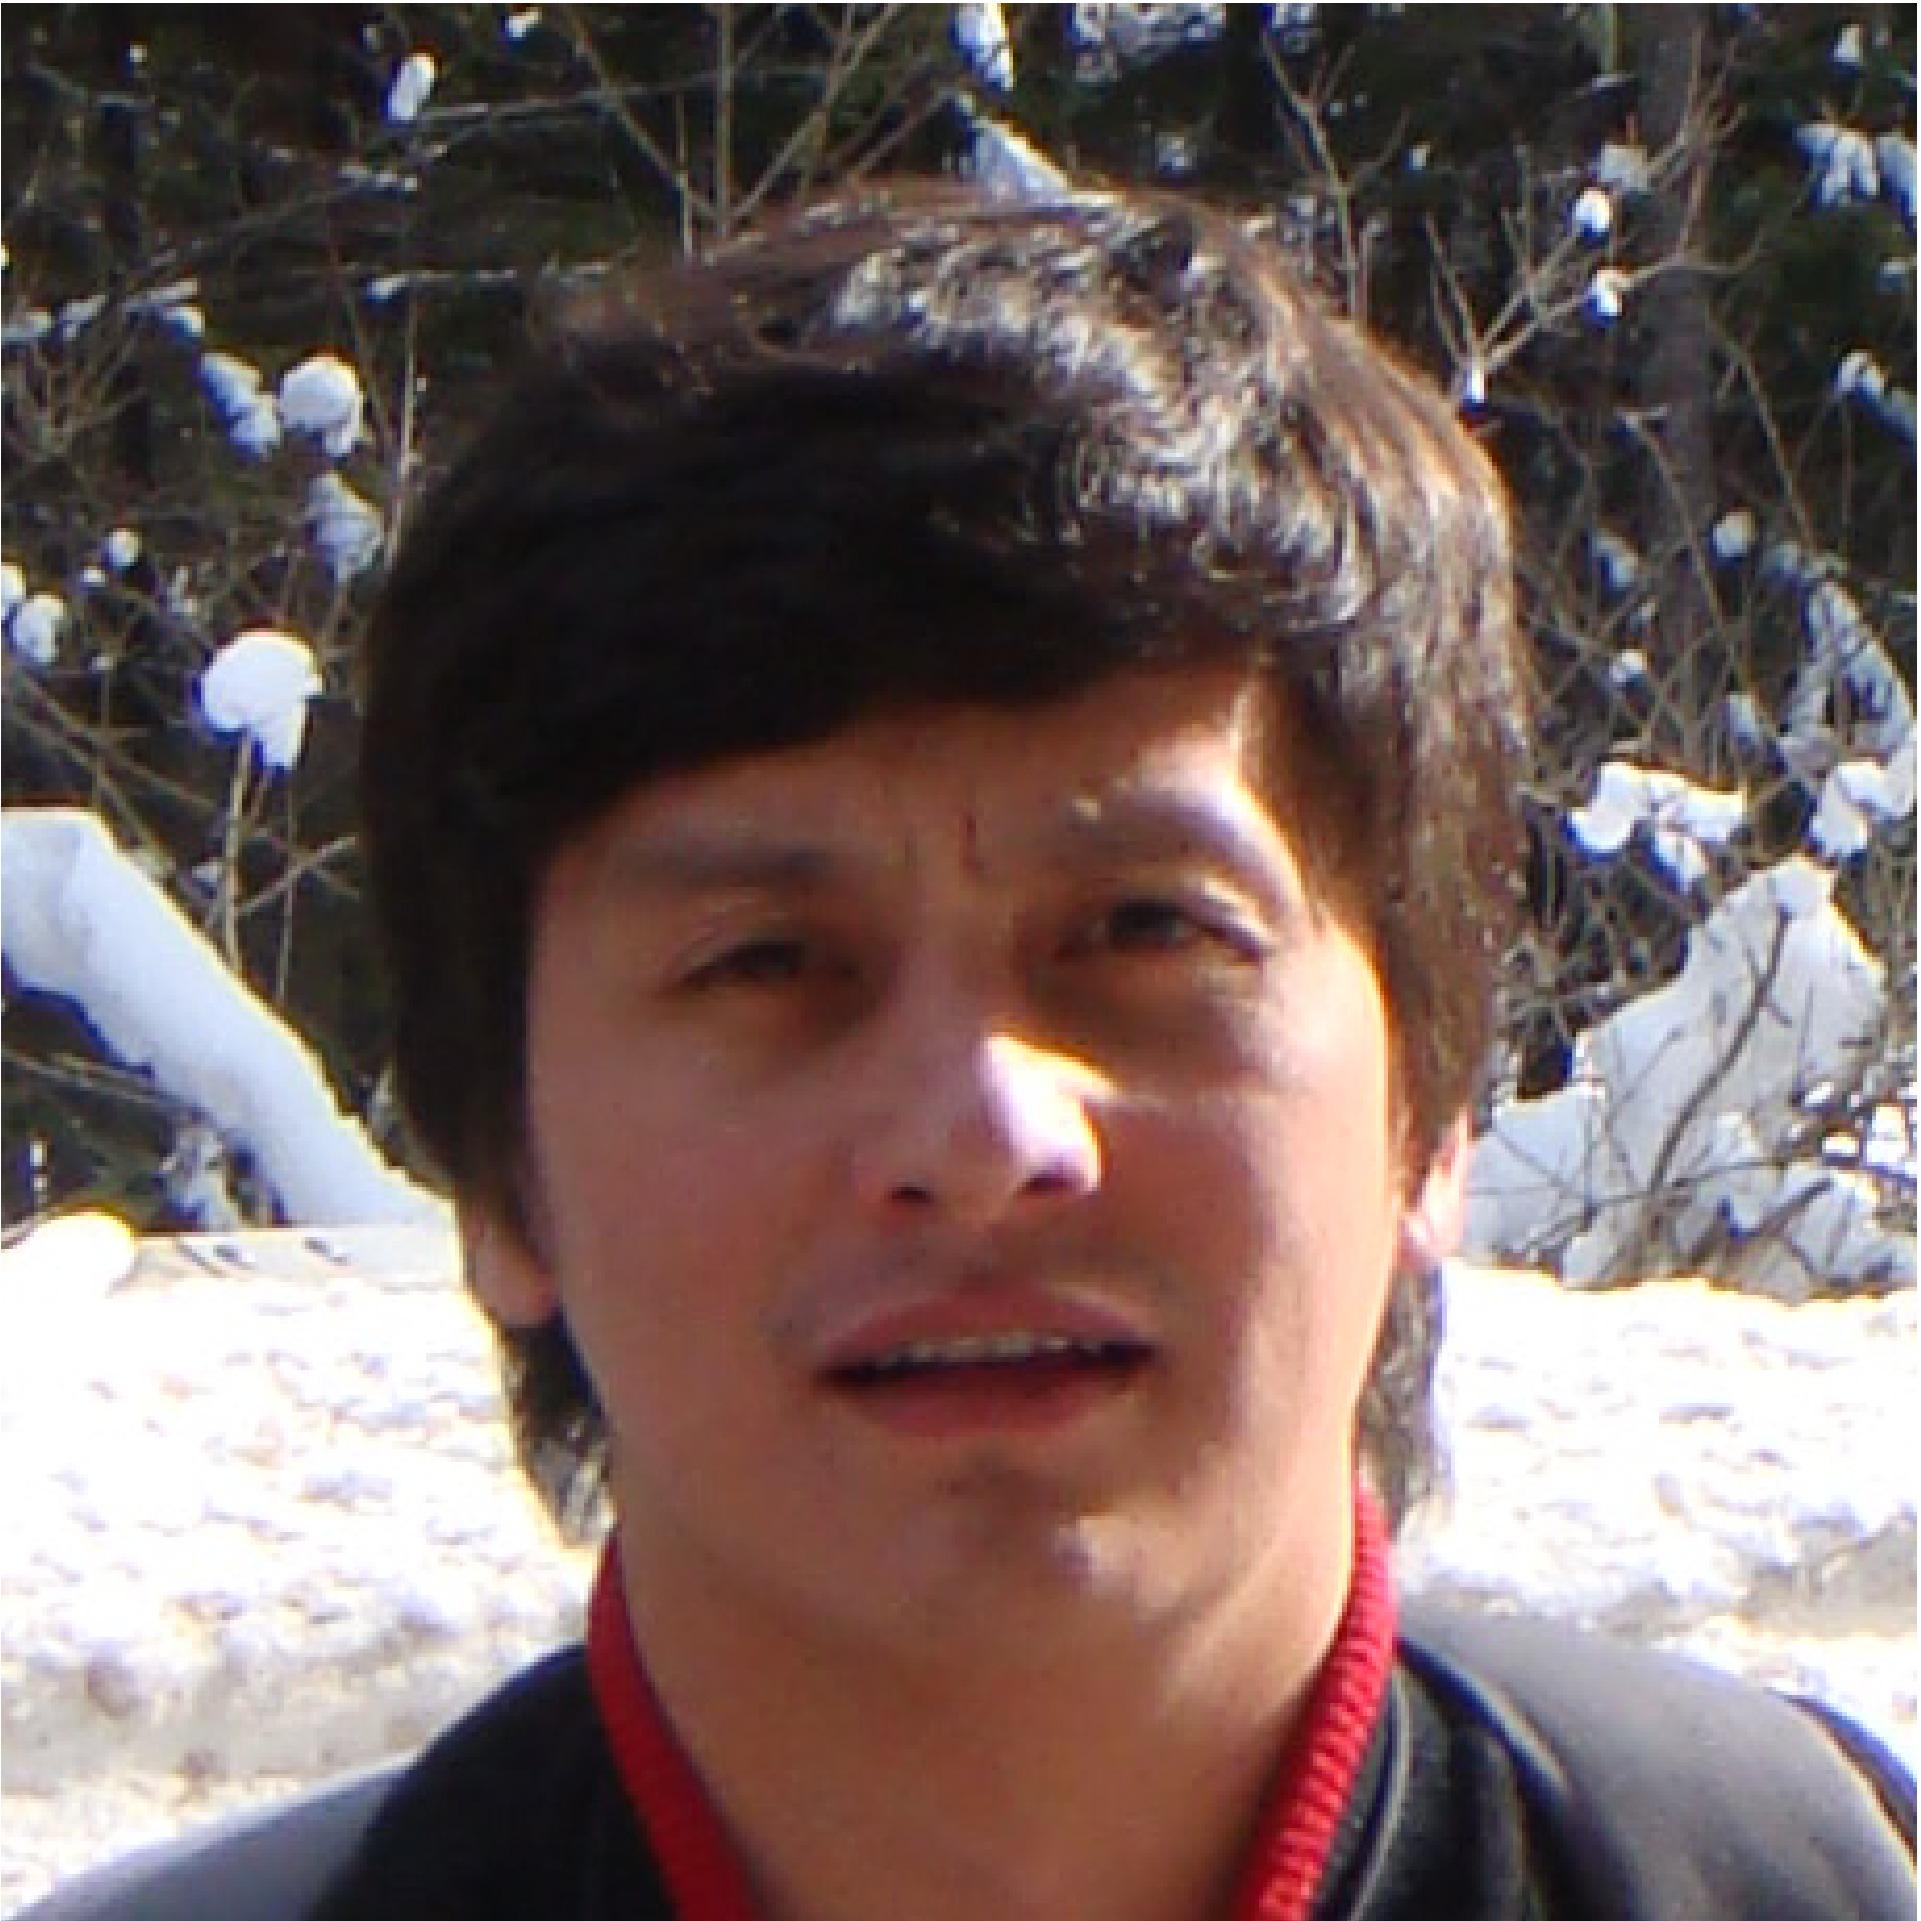 Bruno Yuji Lino Kimura